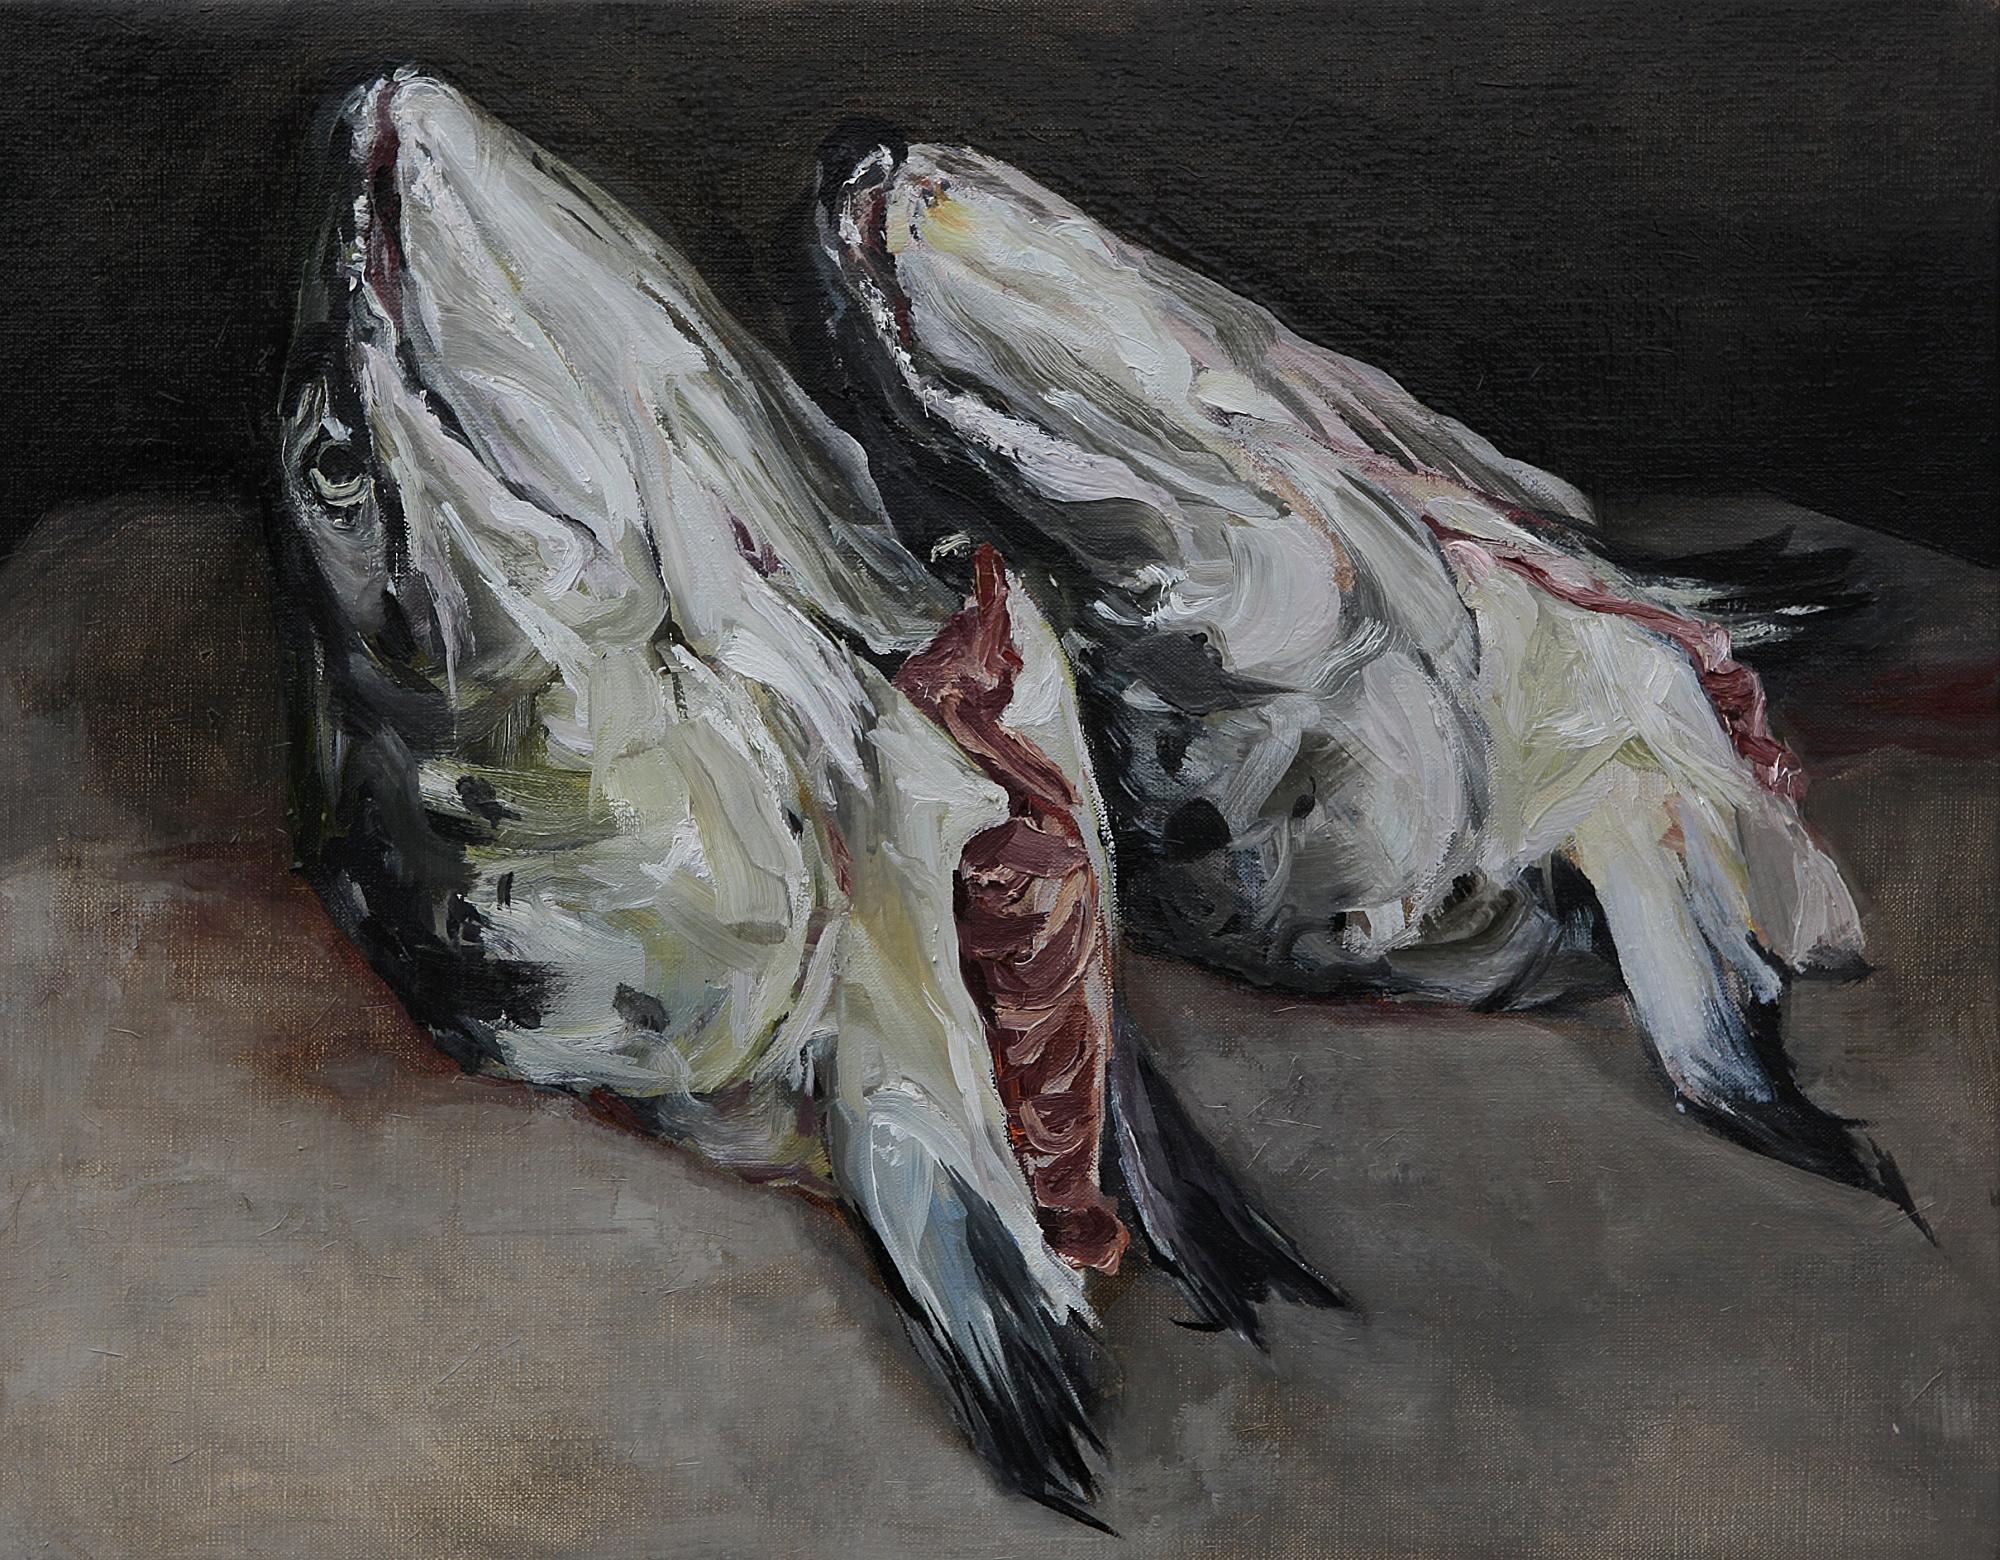 Stilleven met twee zalmkoppen, olieverf op linnen 40 x 50 cm, Stillife with two salmonheads